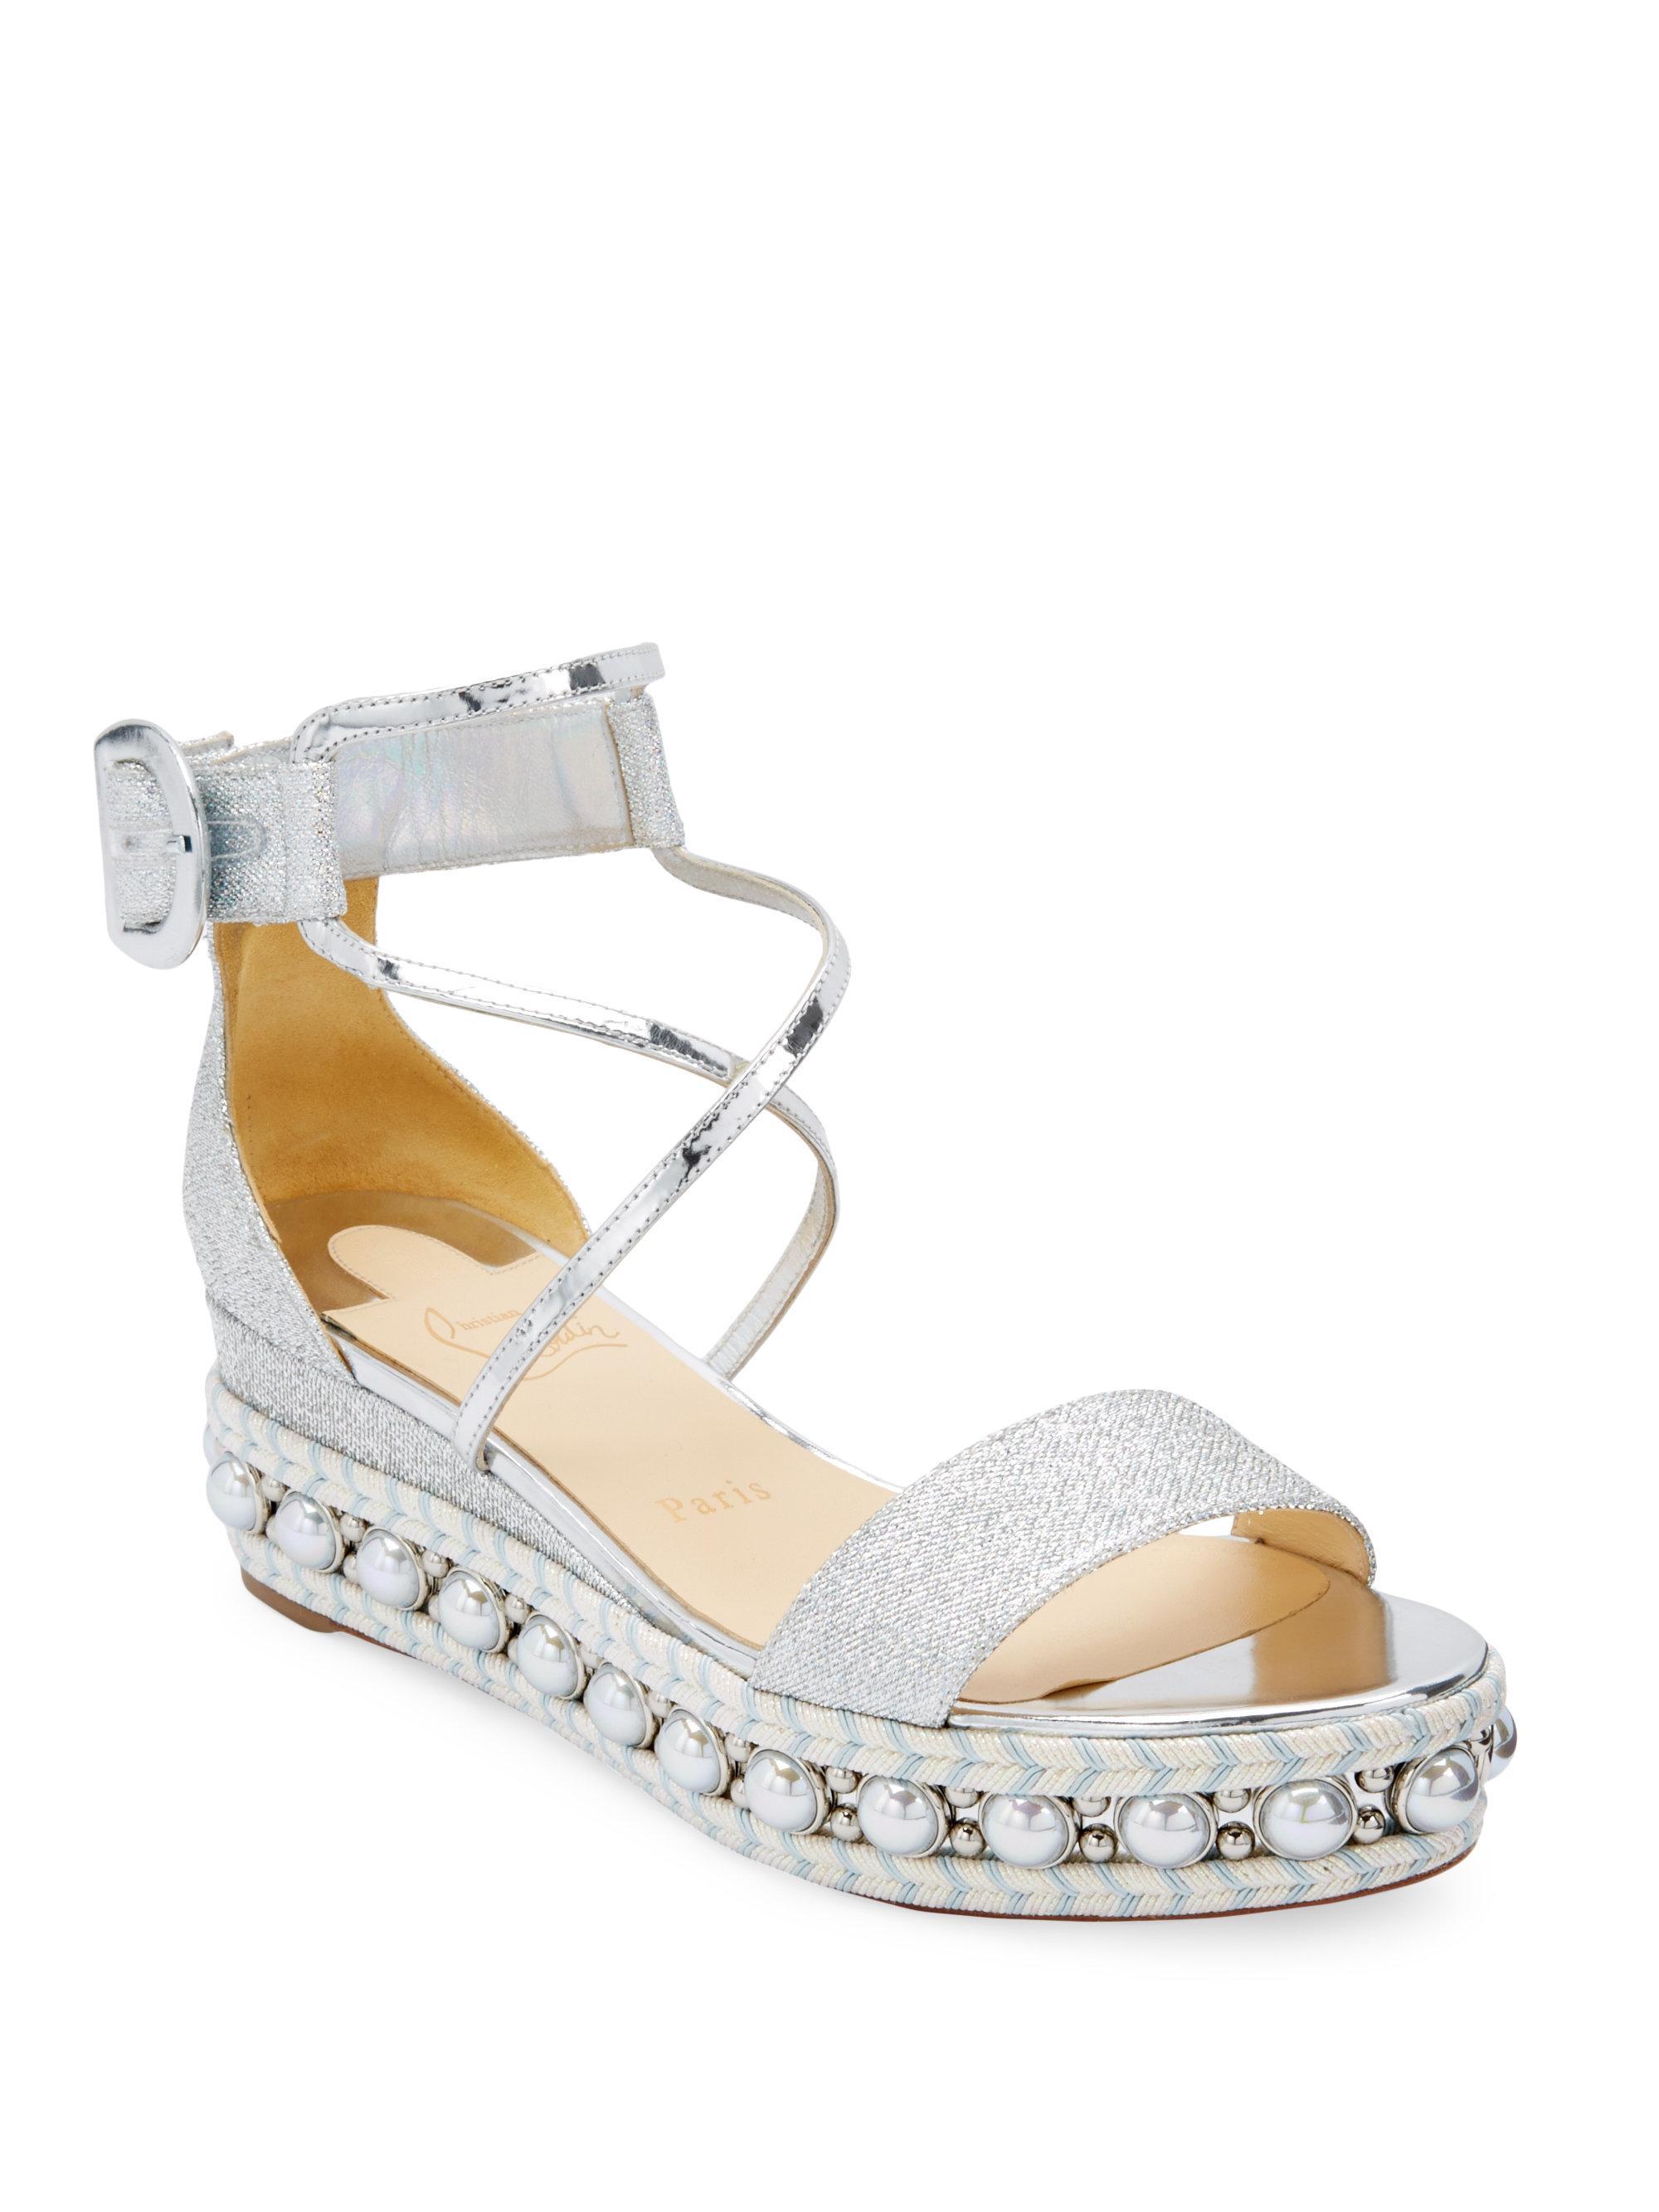 6caadd9aa5a4 Christian Louboutin Chocazeppa Wedge Sandals in Metallic - Lyst